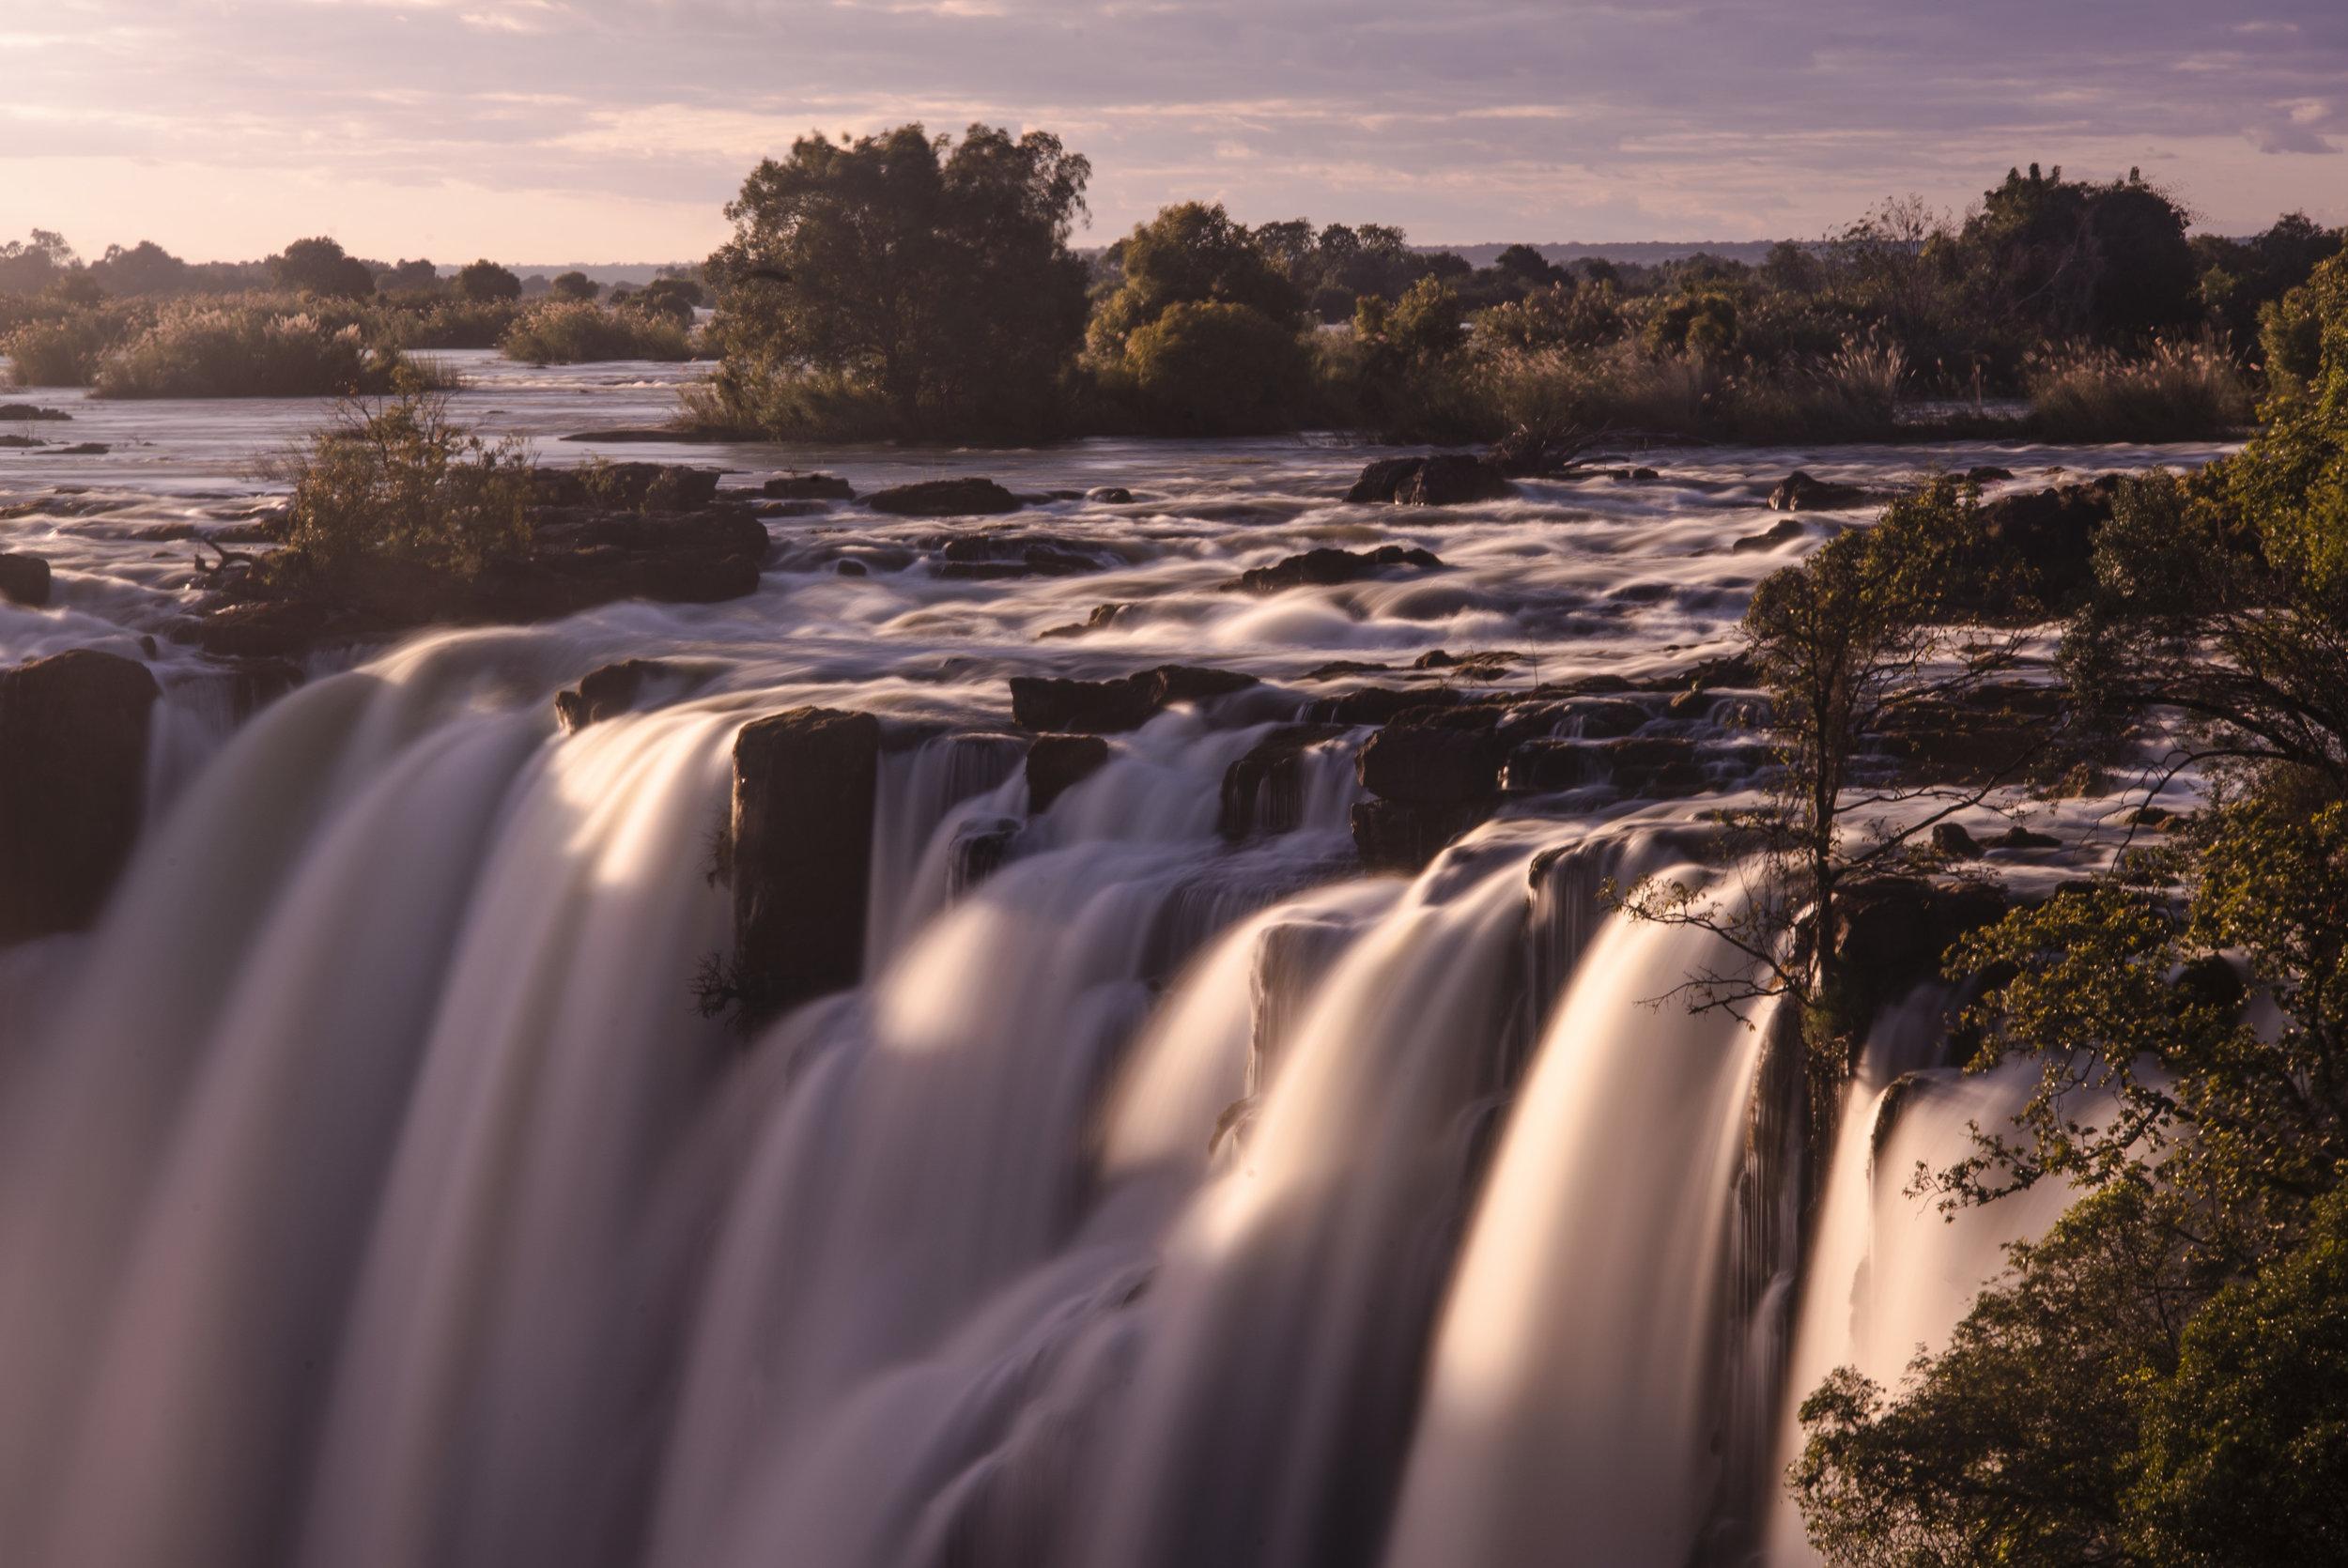 Zimbabwe Victoria Falls Long Exposure Close-Up - Jeff Garriock 2018 DSC08624 Lg RGB.jpg